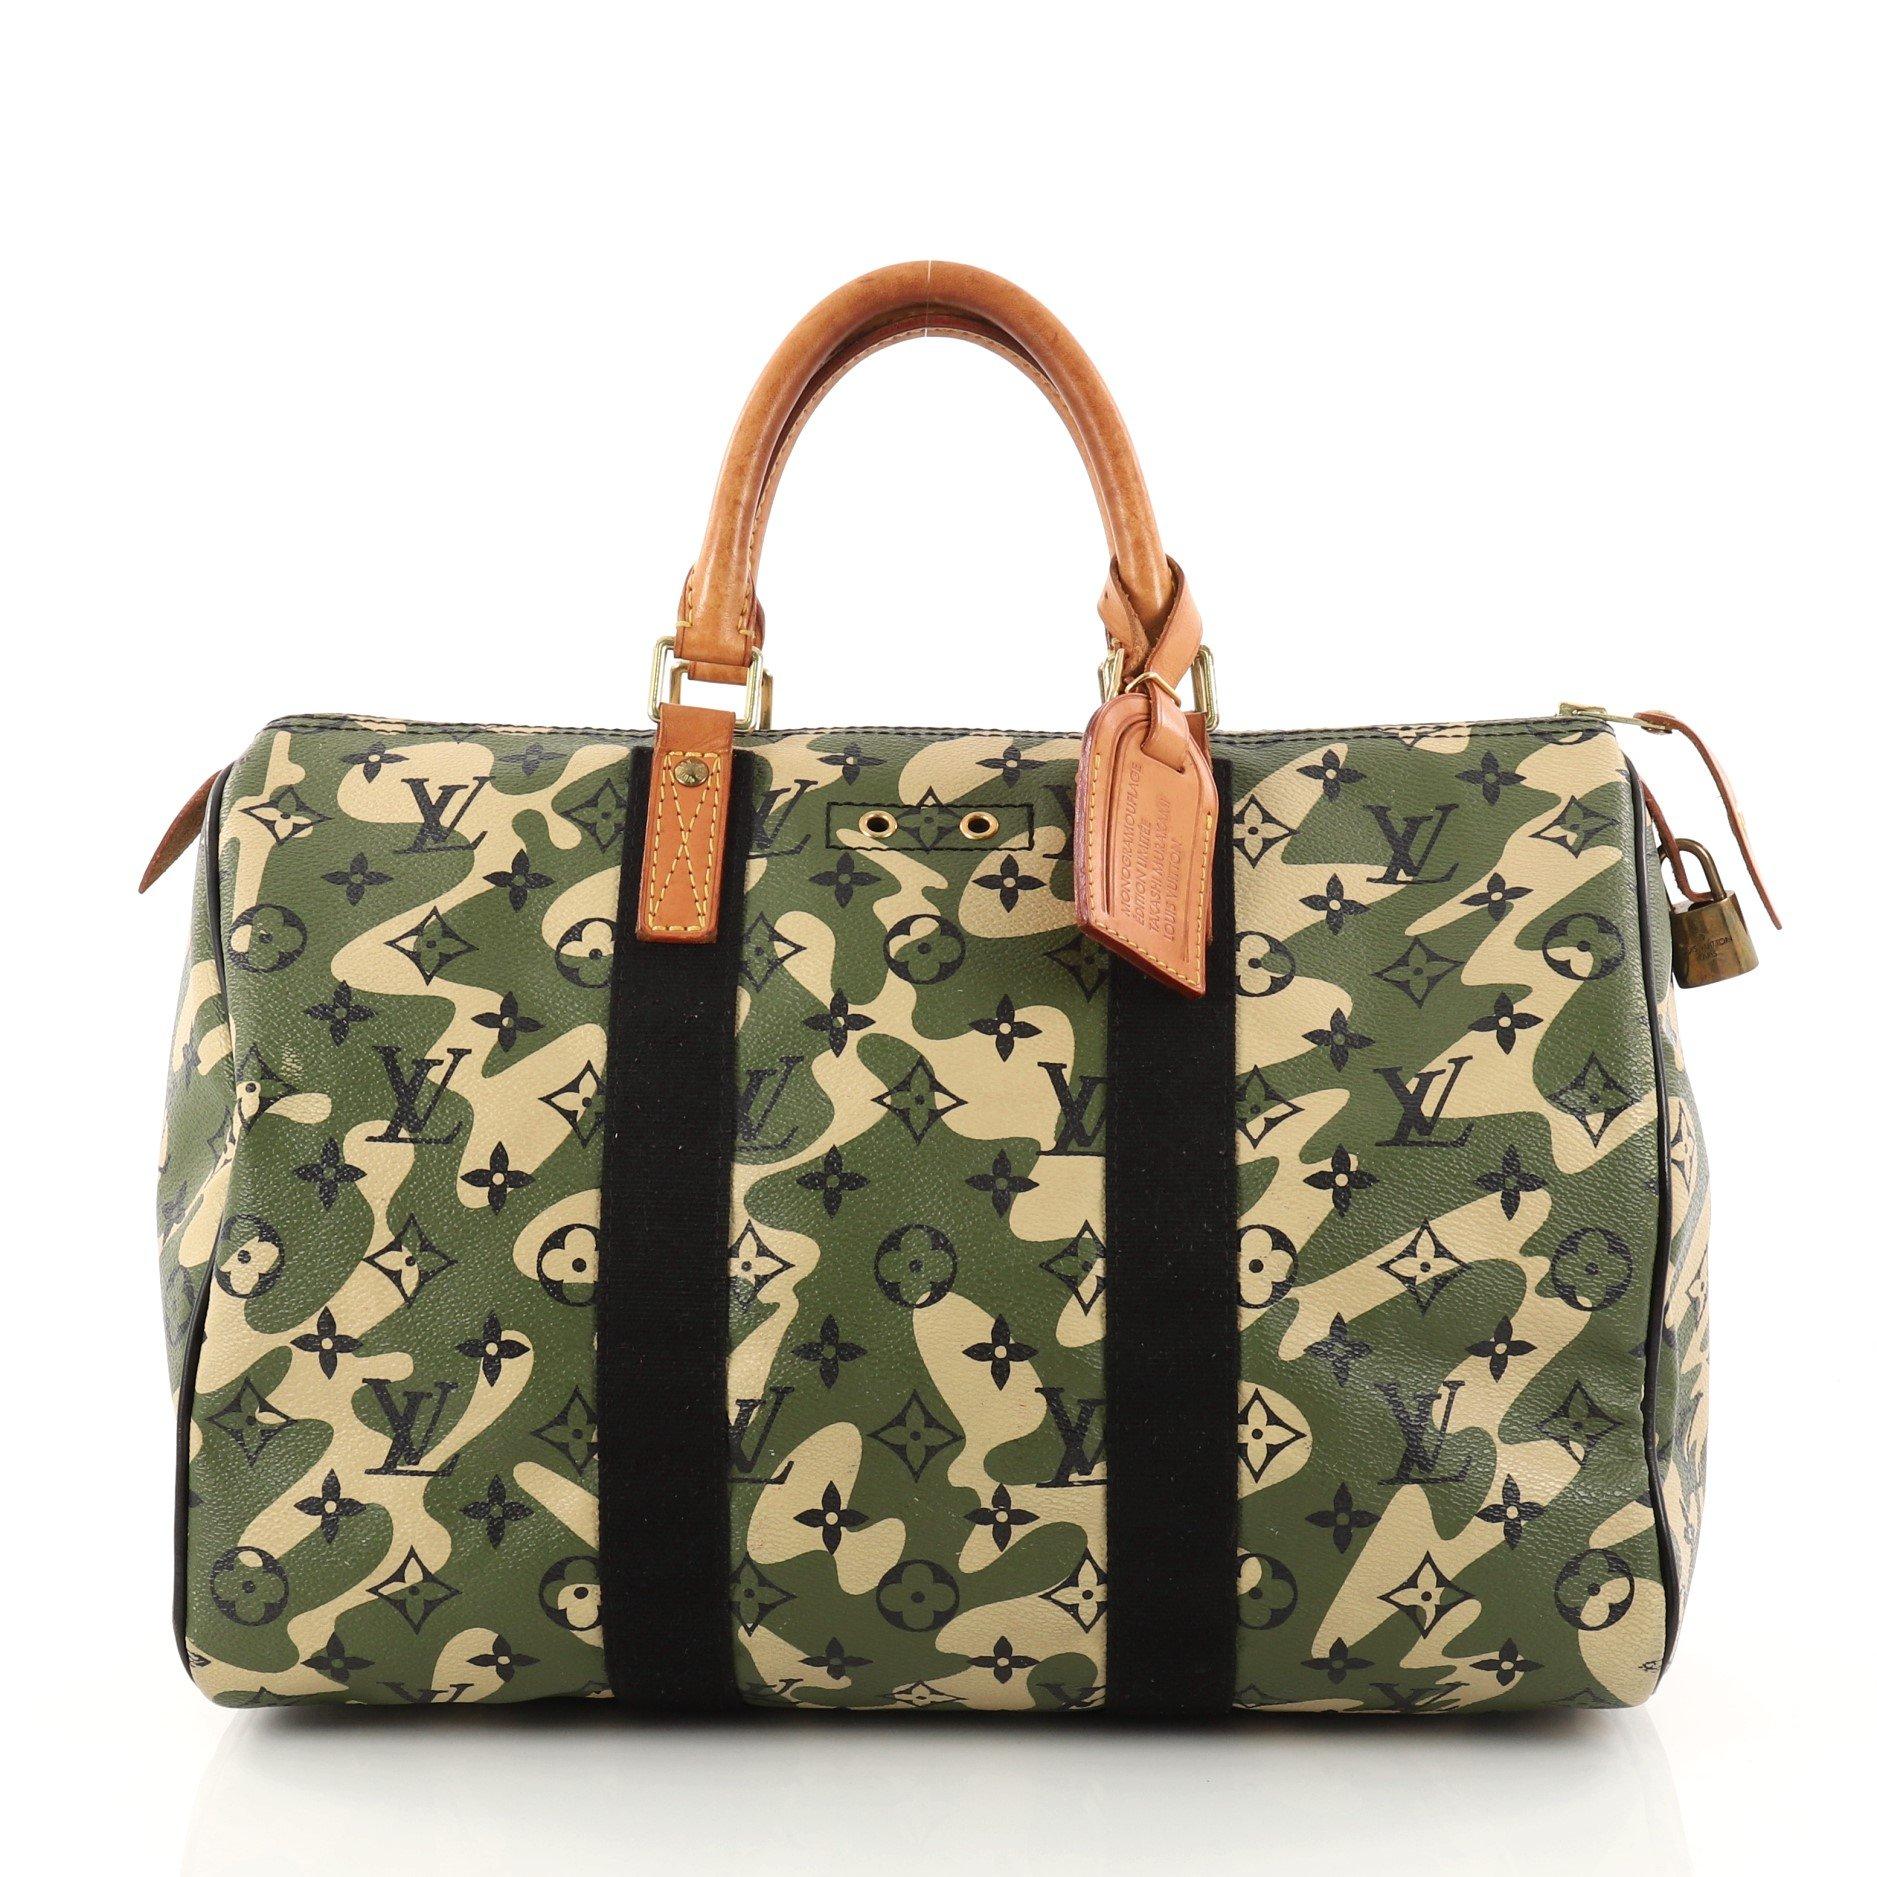 Louis Vuitton Speedy Handbag Monogramouflage